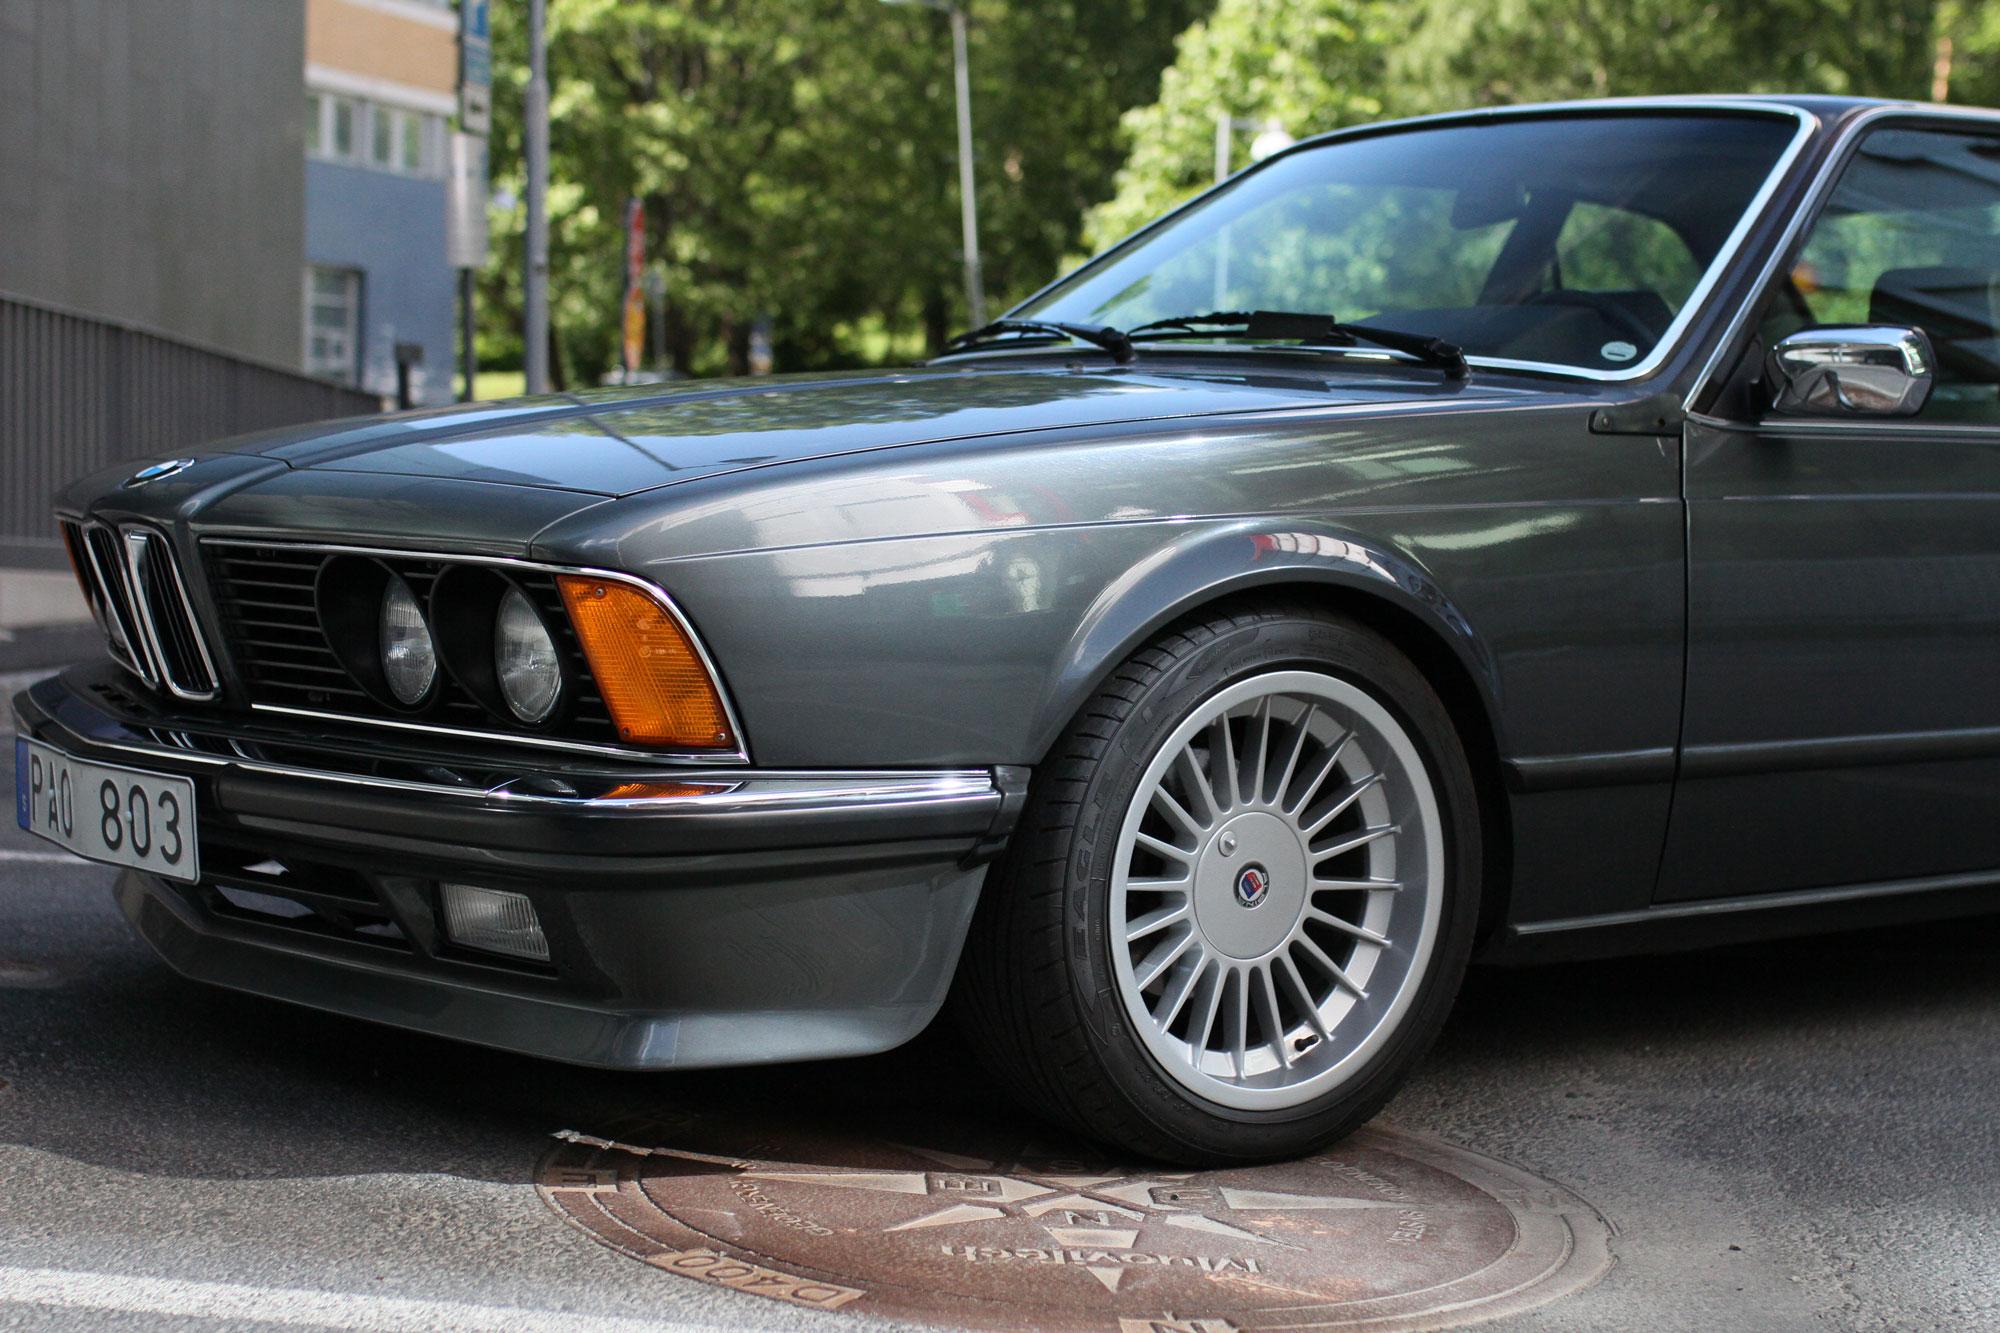 Alpine 17´fälgar på en BMW - BMW 635 CSi